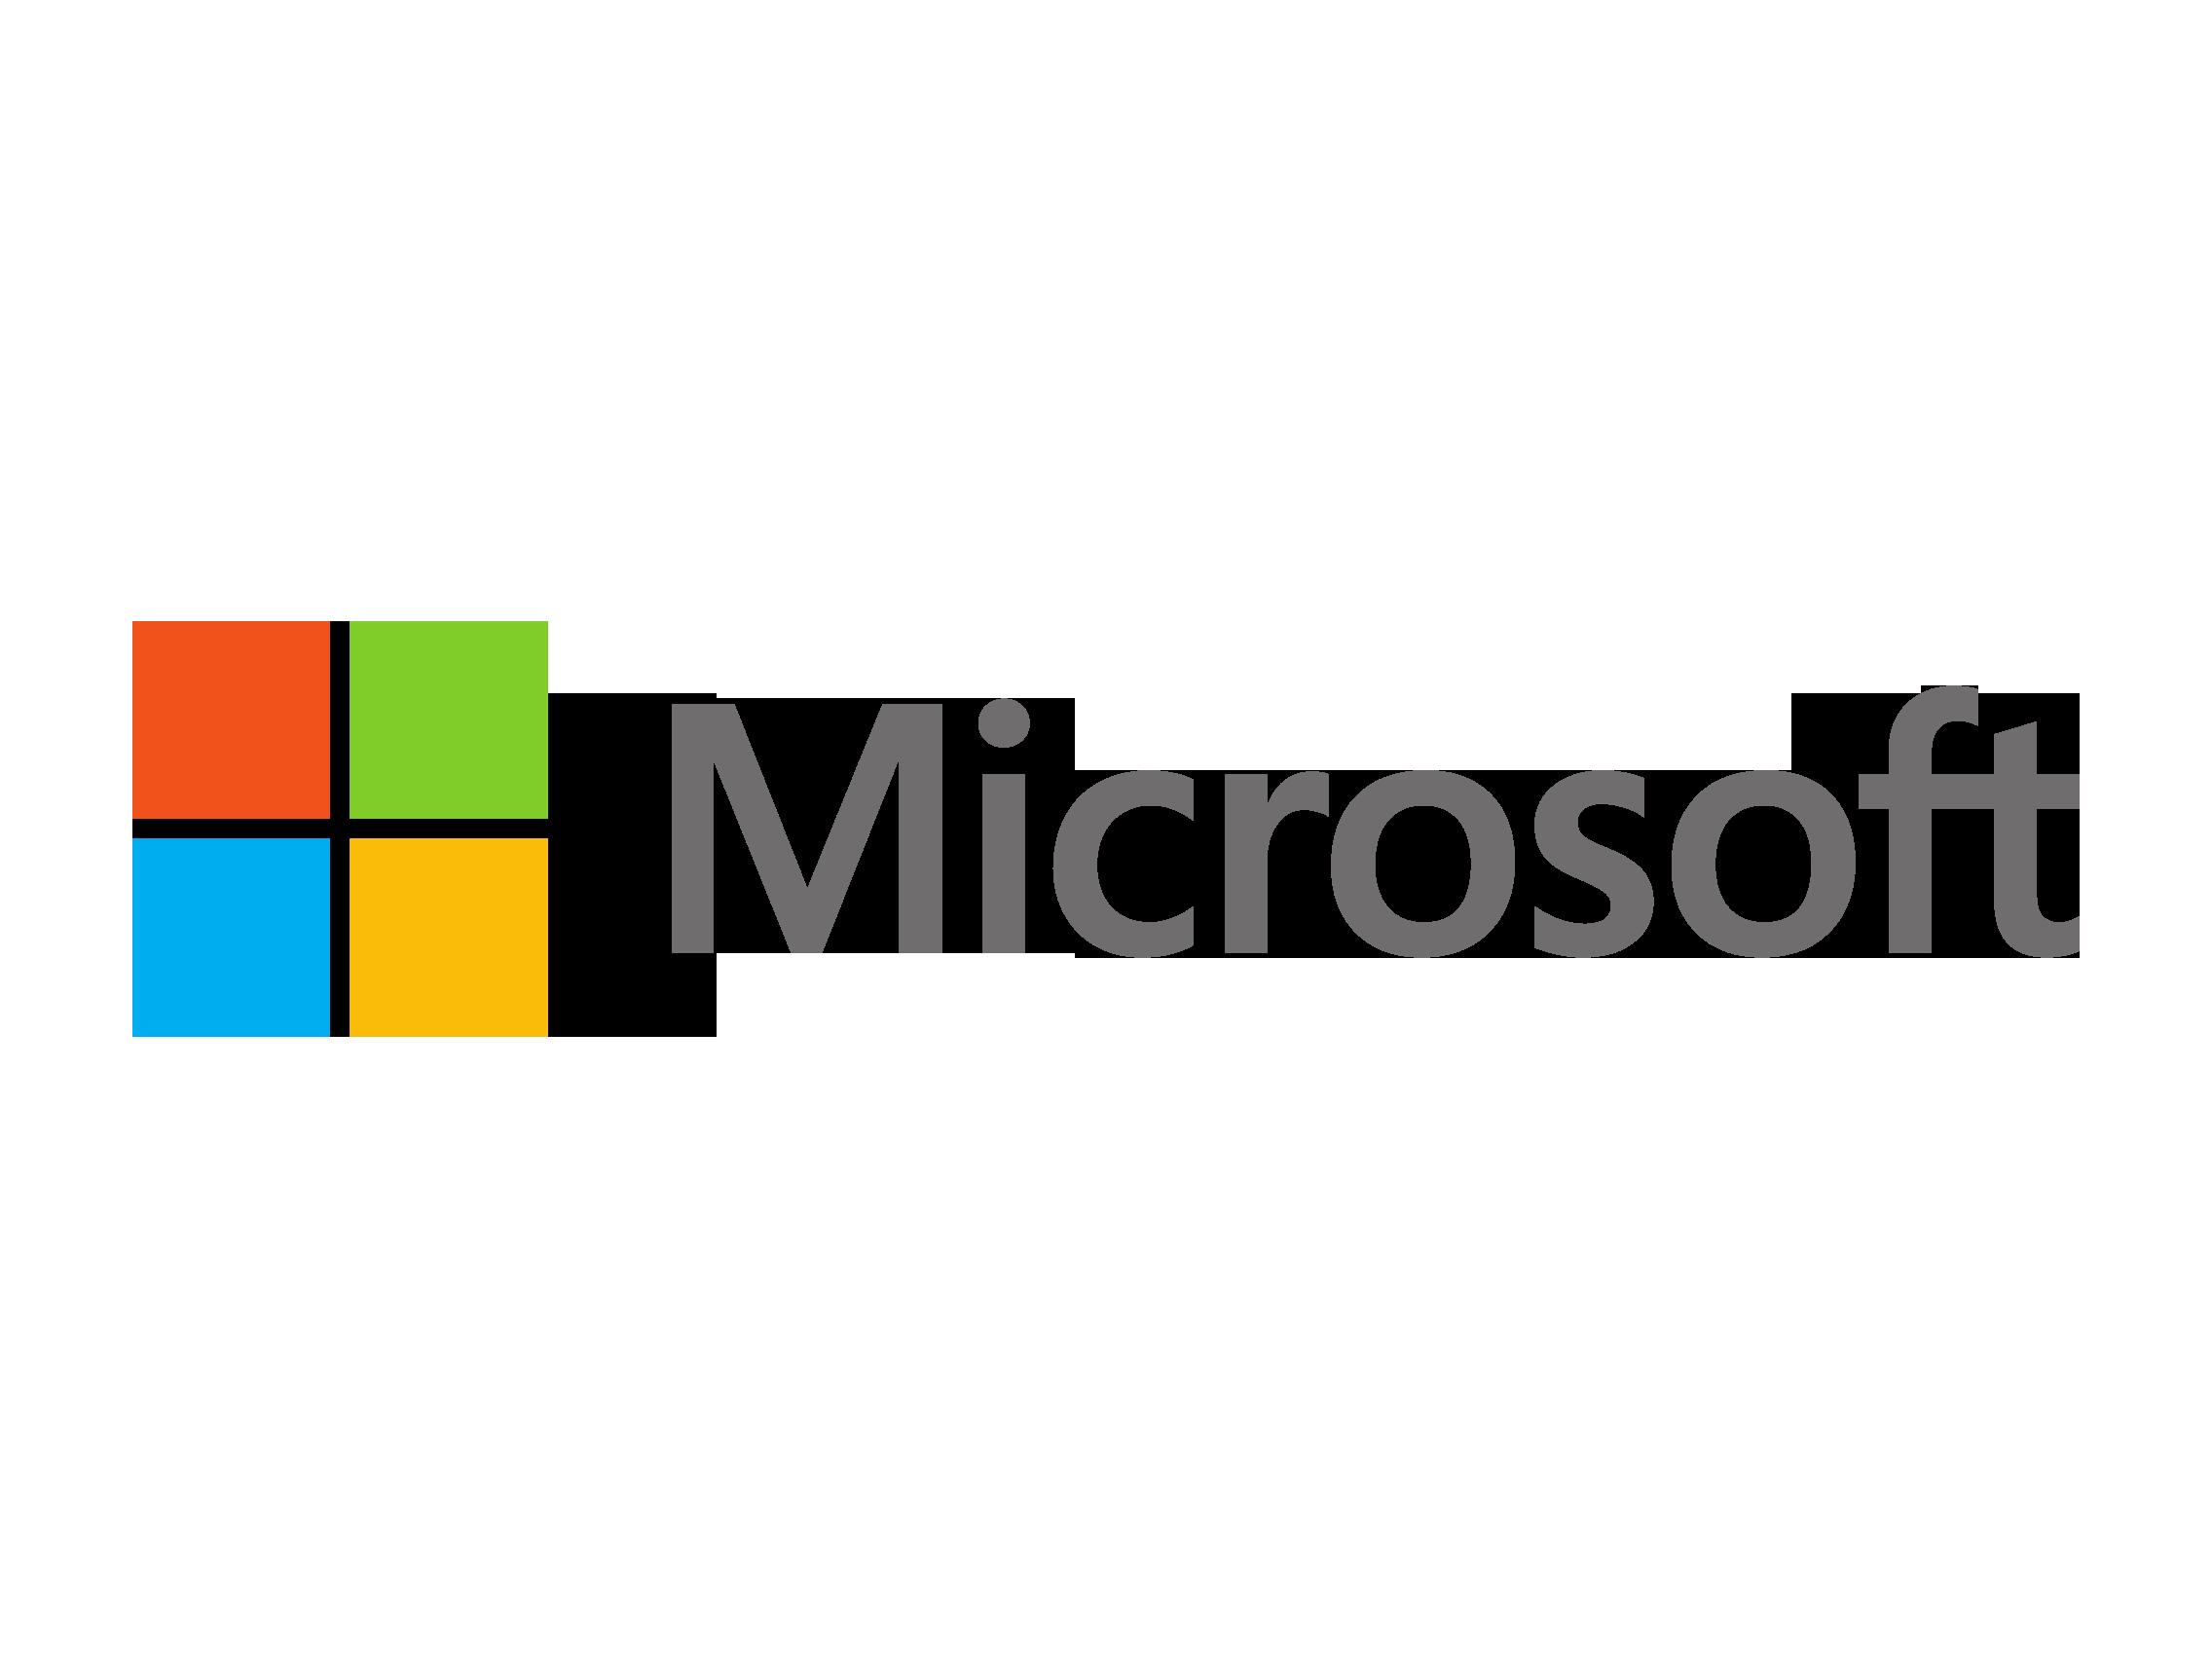 Microsoft-logo-and-wordmark